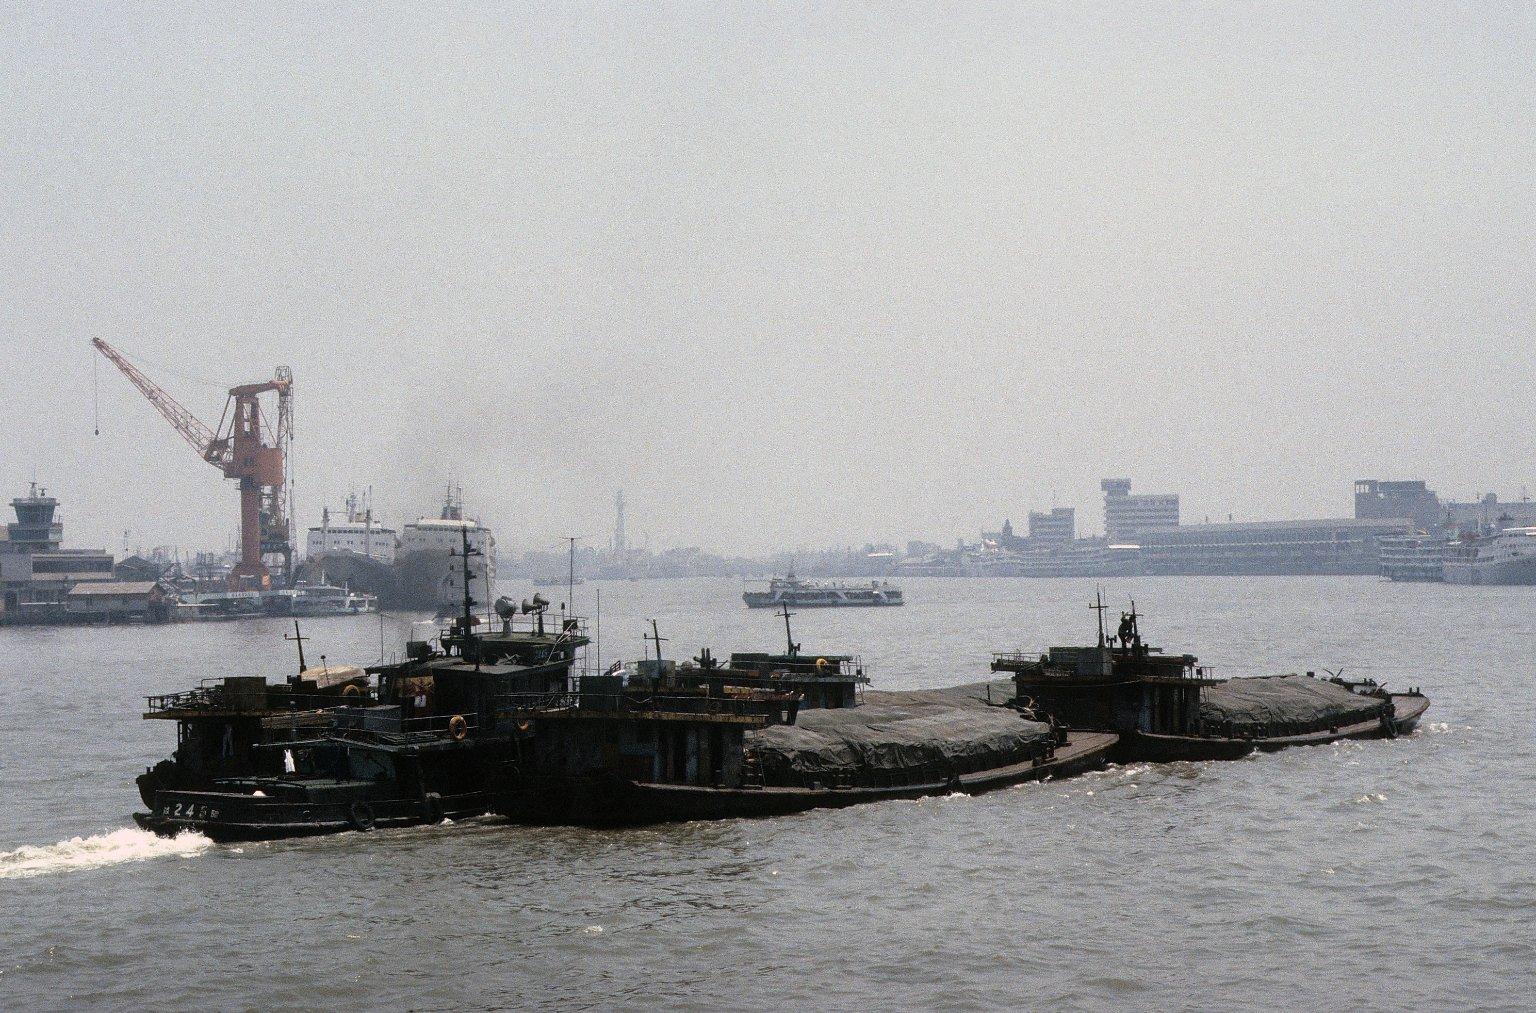 Port of Shanghai